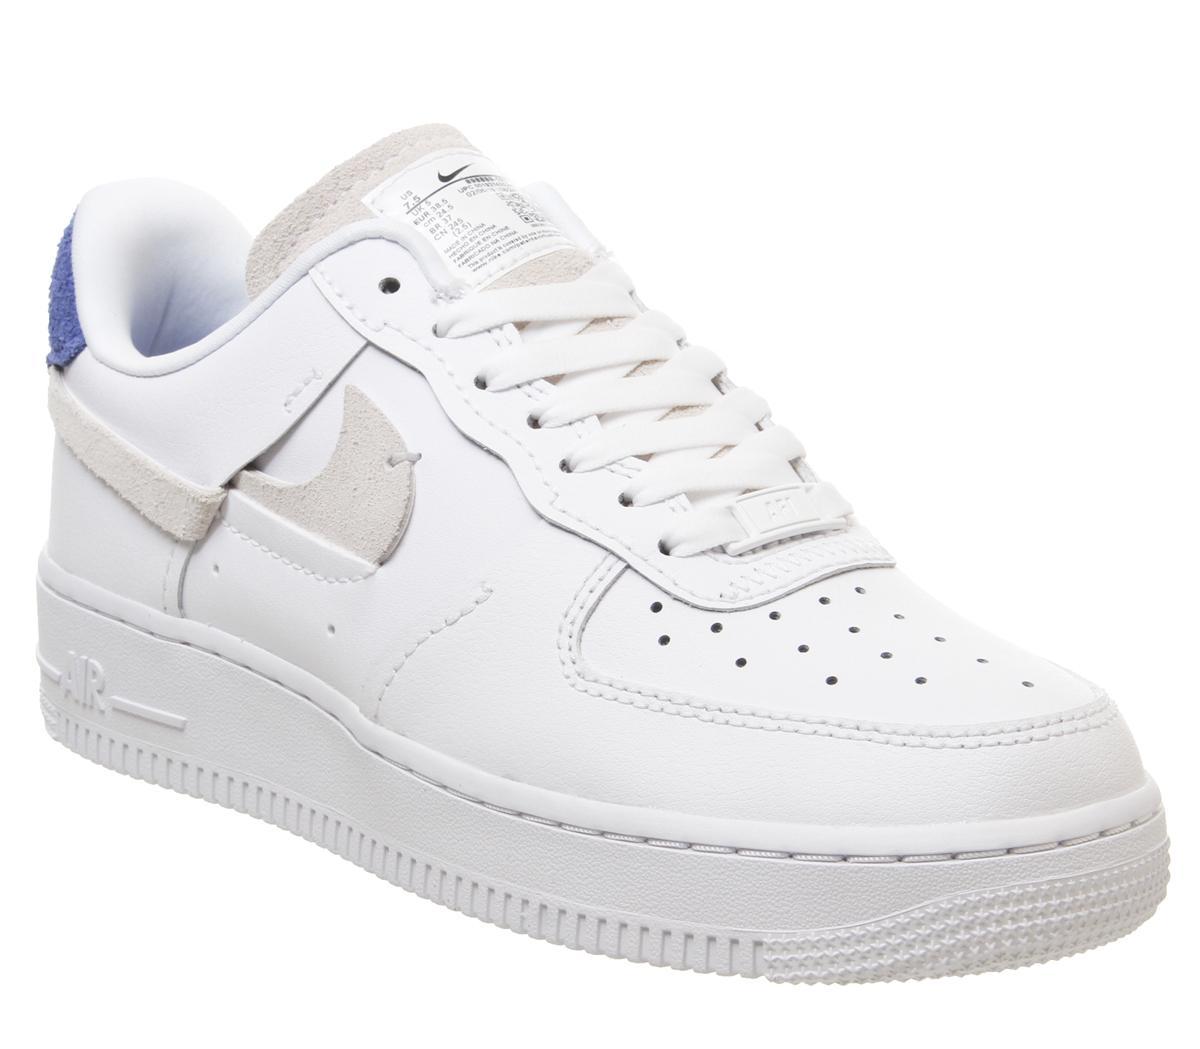 Nike Air Force 1 07 WHITE PLATINUM TINT